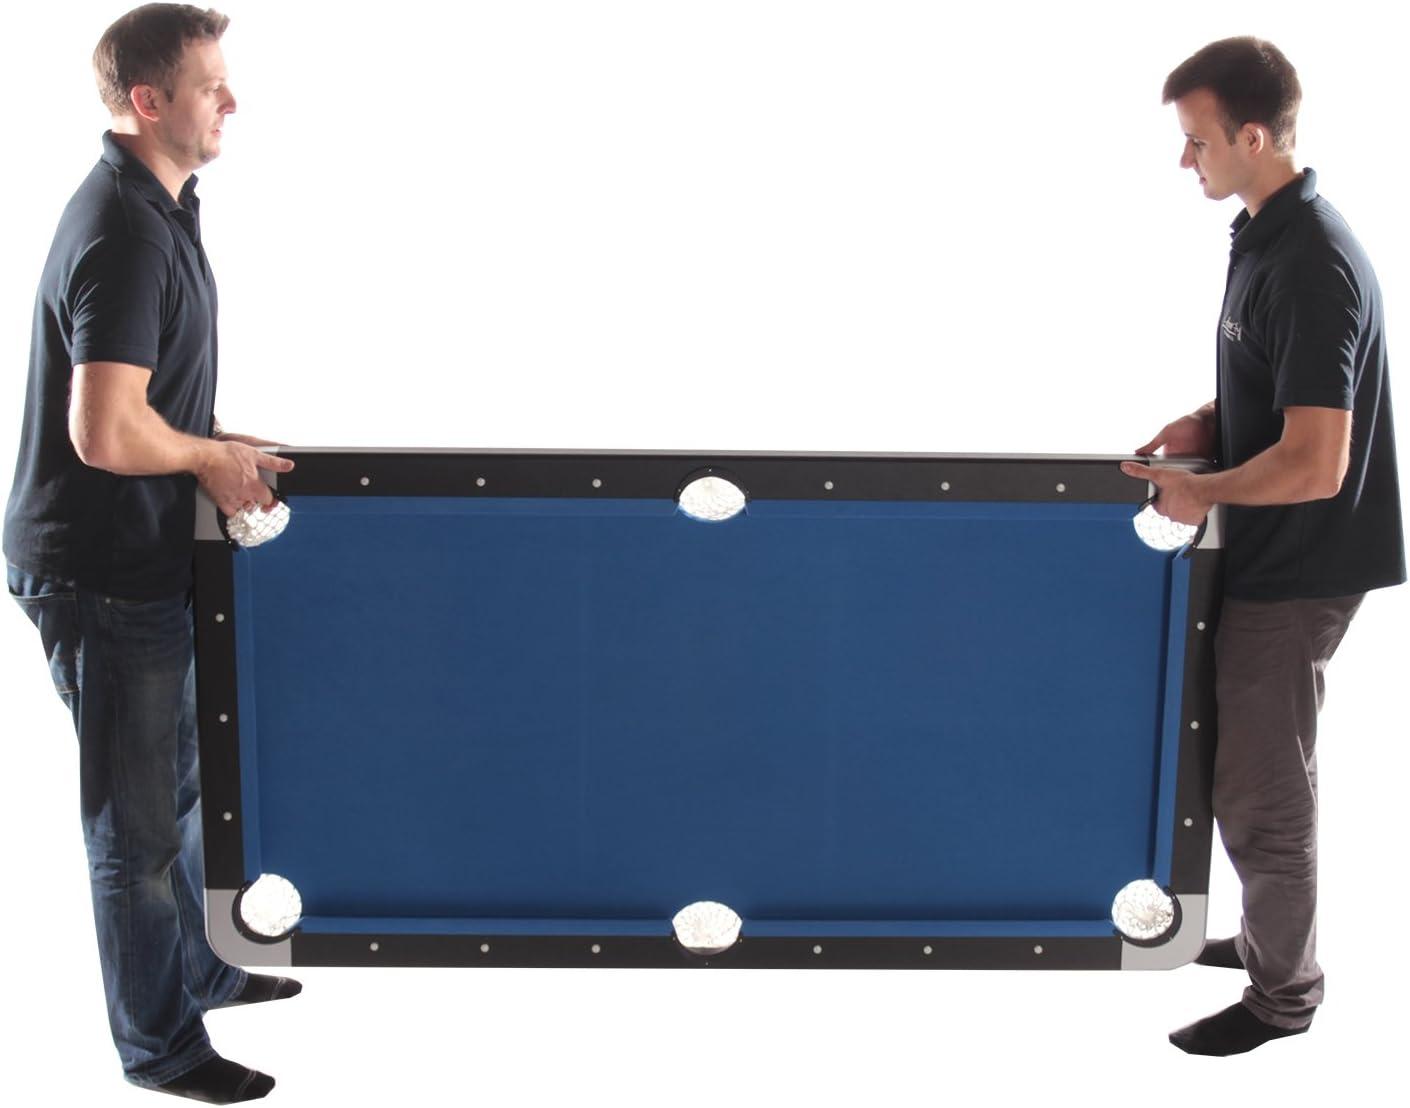 Tekscore - Mesa de billar plegable con parte superior para tenis ...